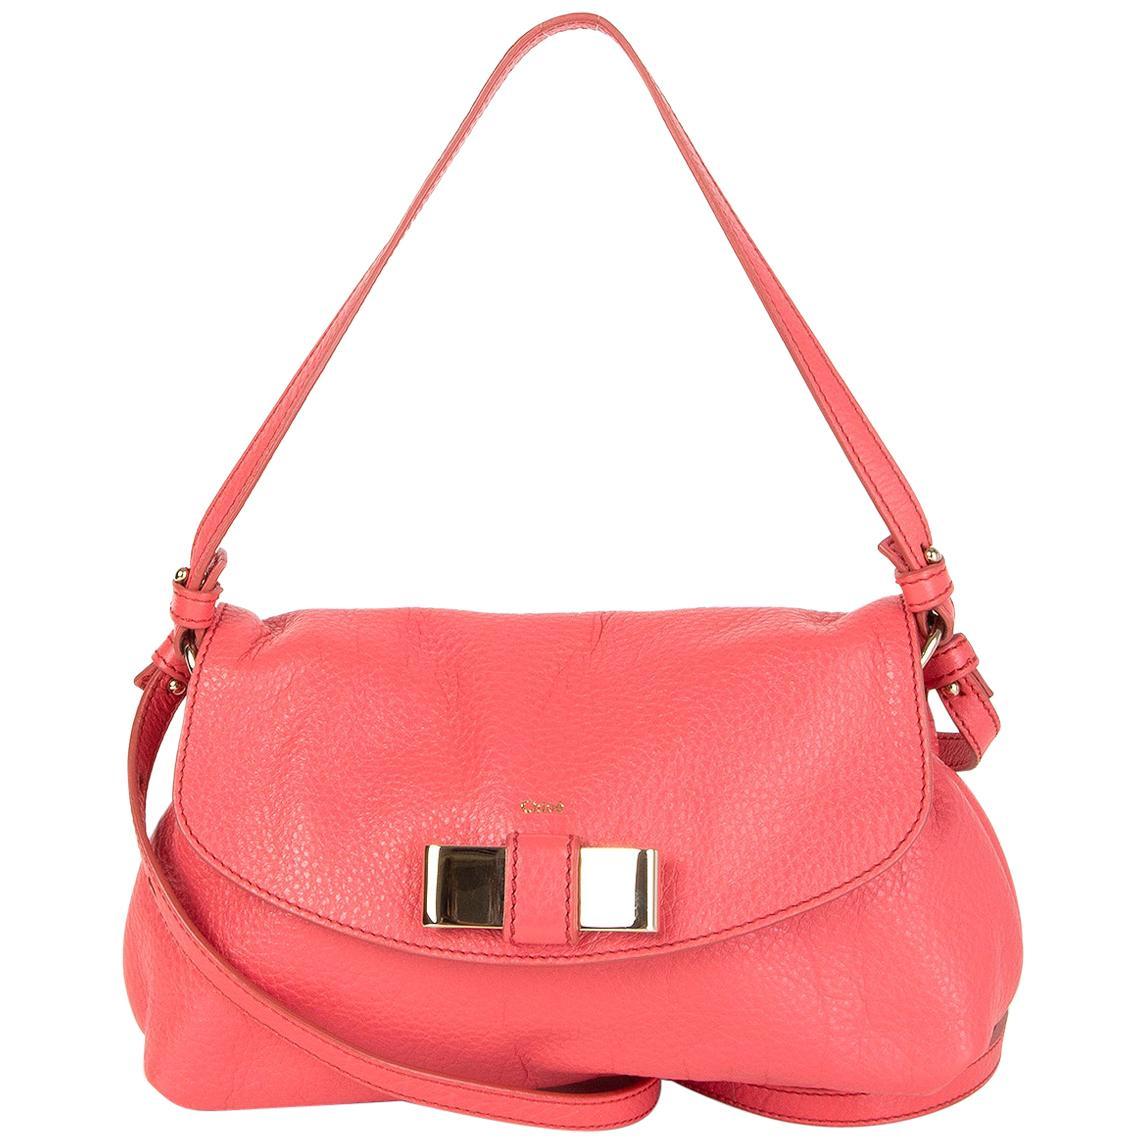 CHLOE bubblegum pink leather LILY Crossbody Shoulder Bag